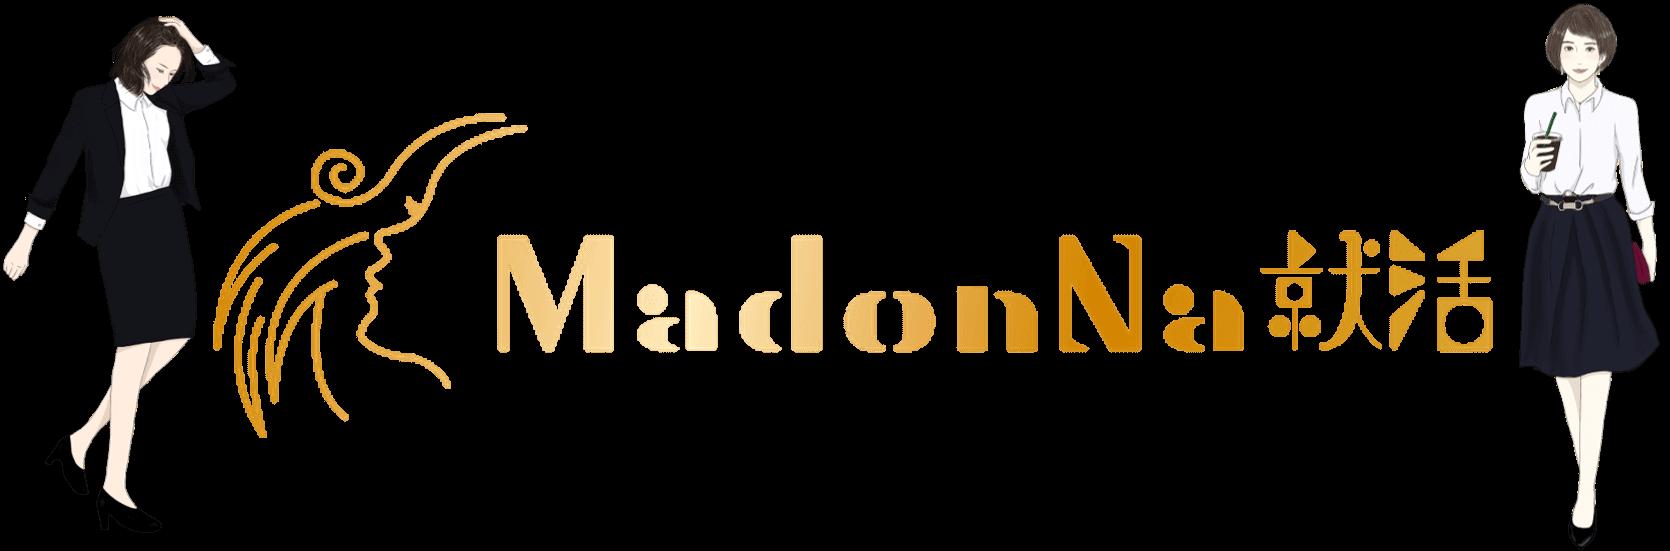 MadonNa就活